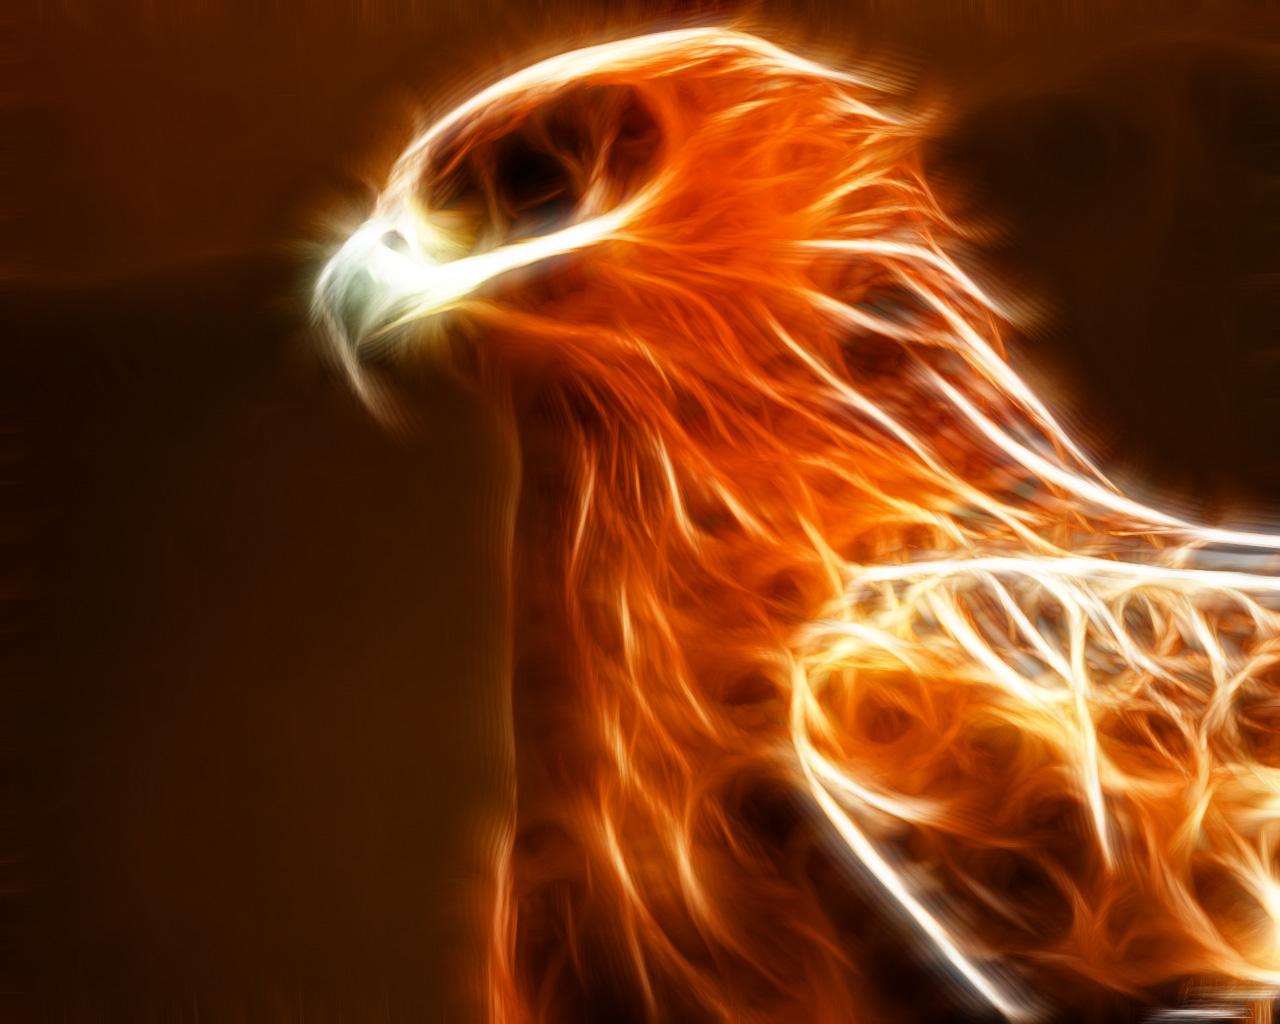 phoenix wallpaper hd - photo #30